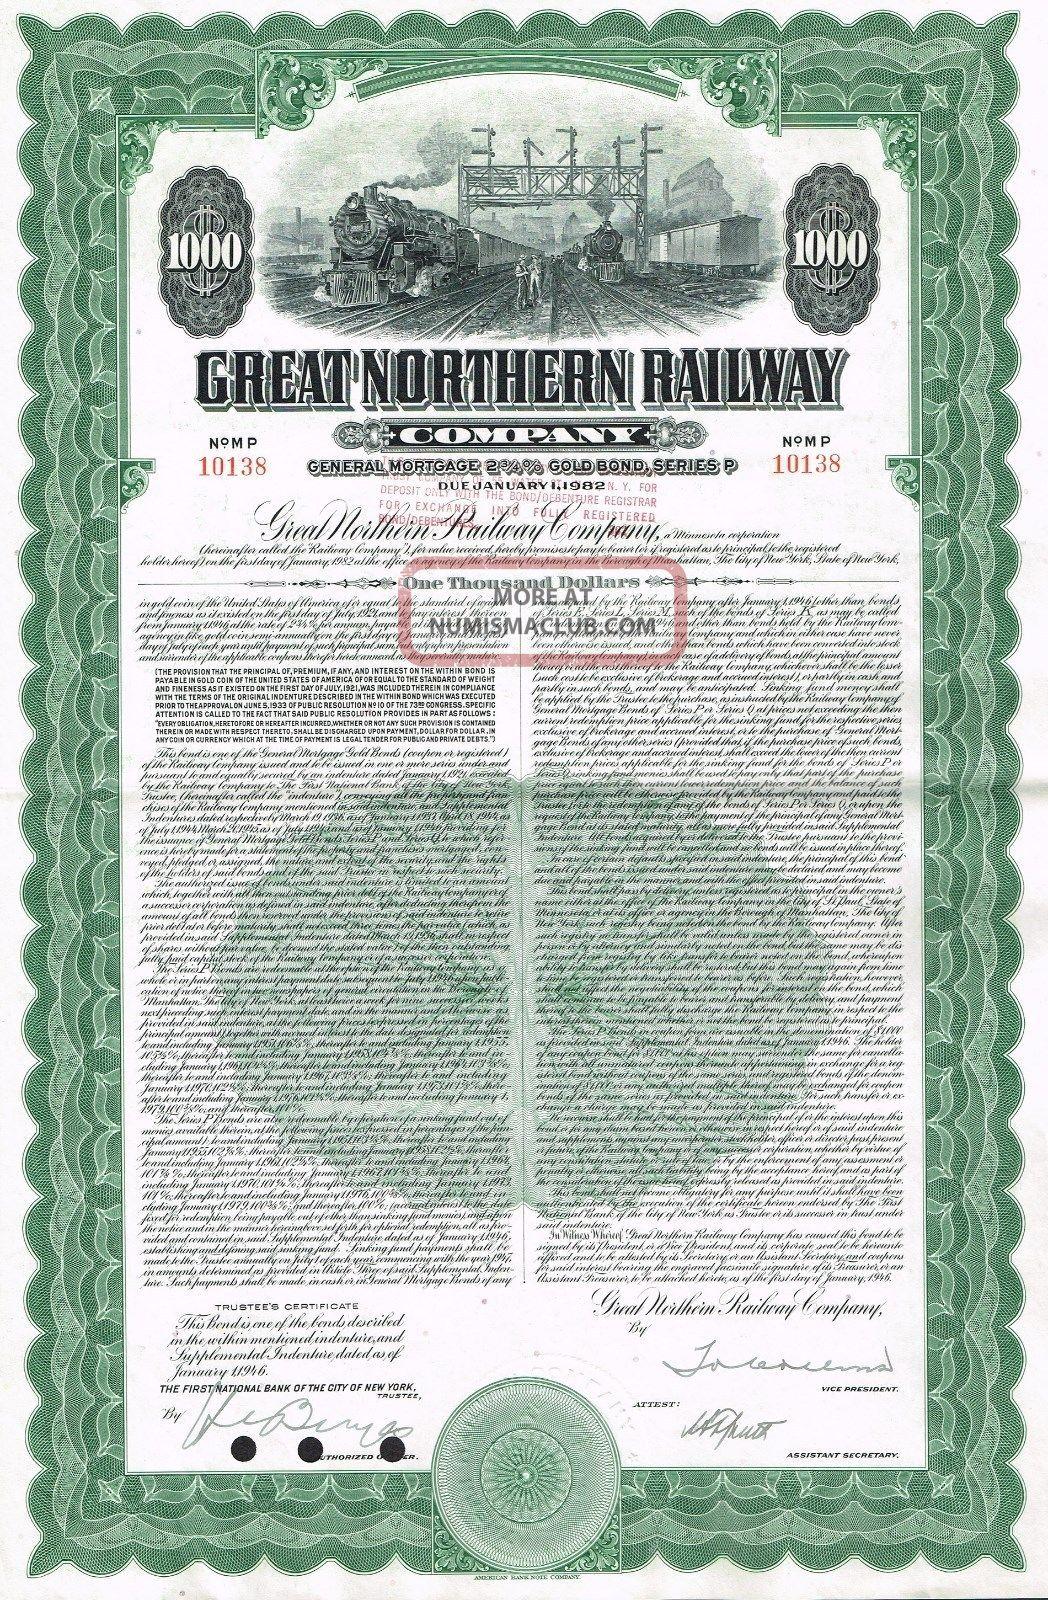 Usa Great Northern Railway Company Gold Bond Stock Certificate World photo